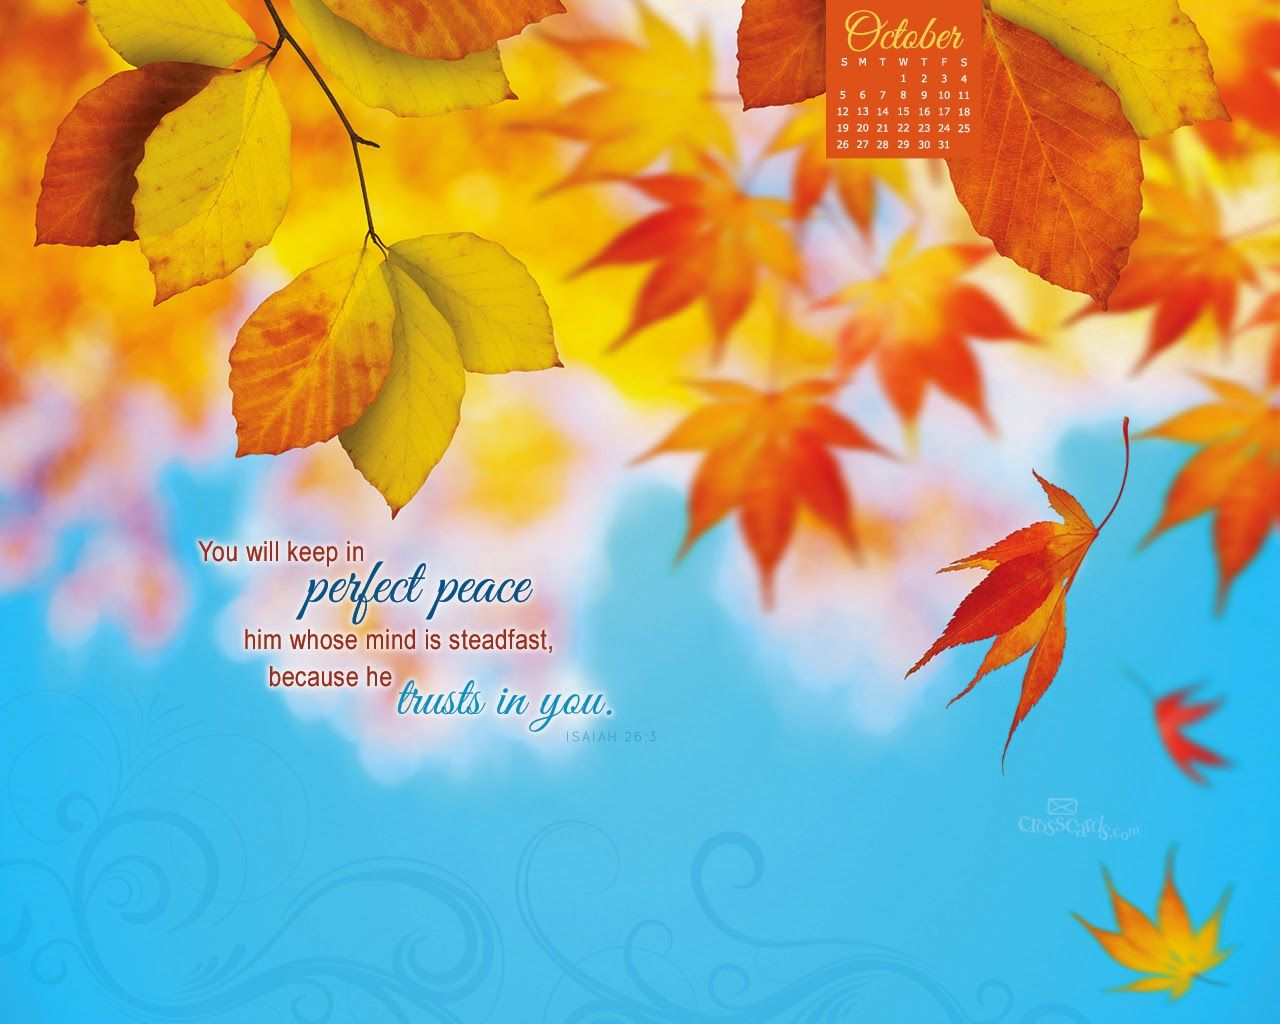 October 2014 Bible Verse Desktop Calendar Christian Wallpaper Scripture Wallpaper Perfect Peace